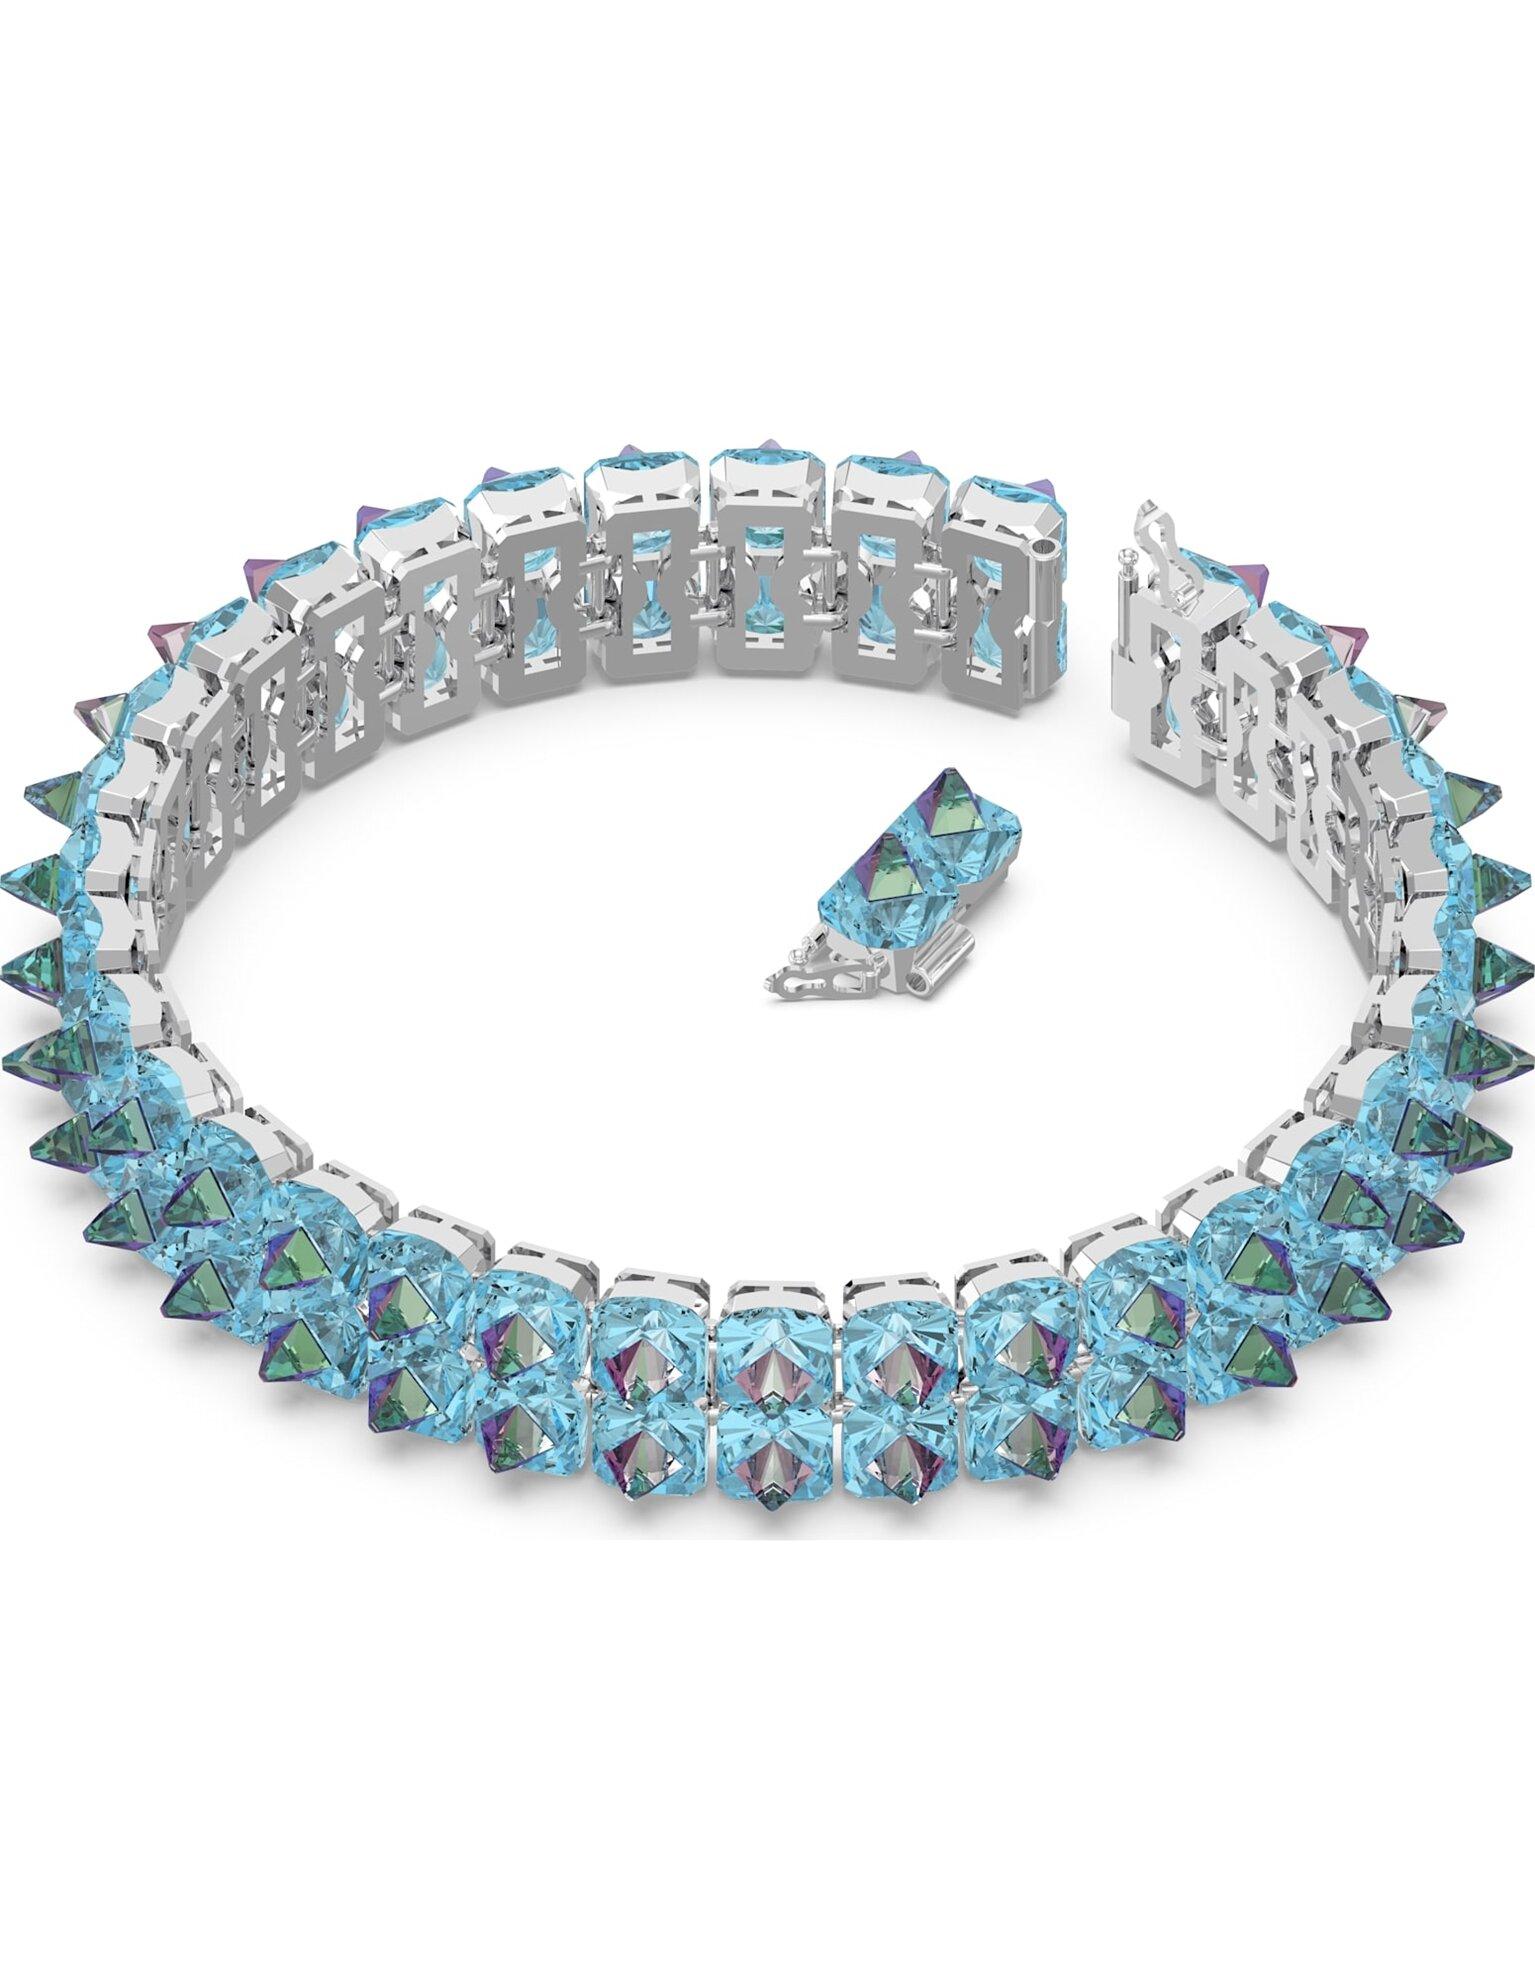 Picture of Chroma Gerdanlık, Sivri uç kristaller, Mavi, Rodyum kaplama